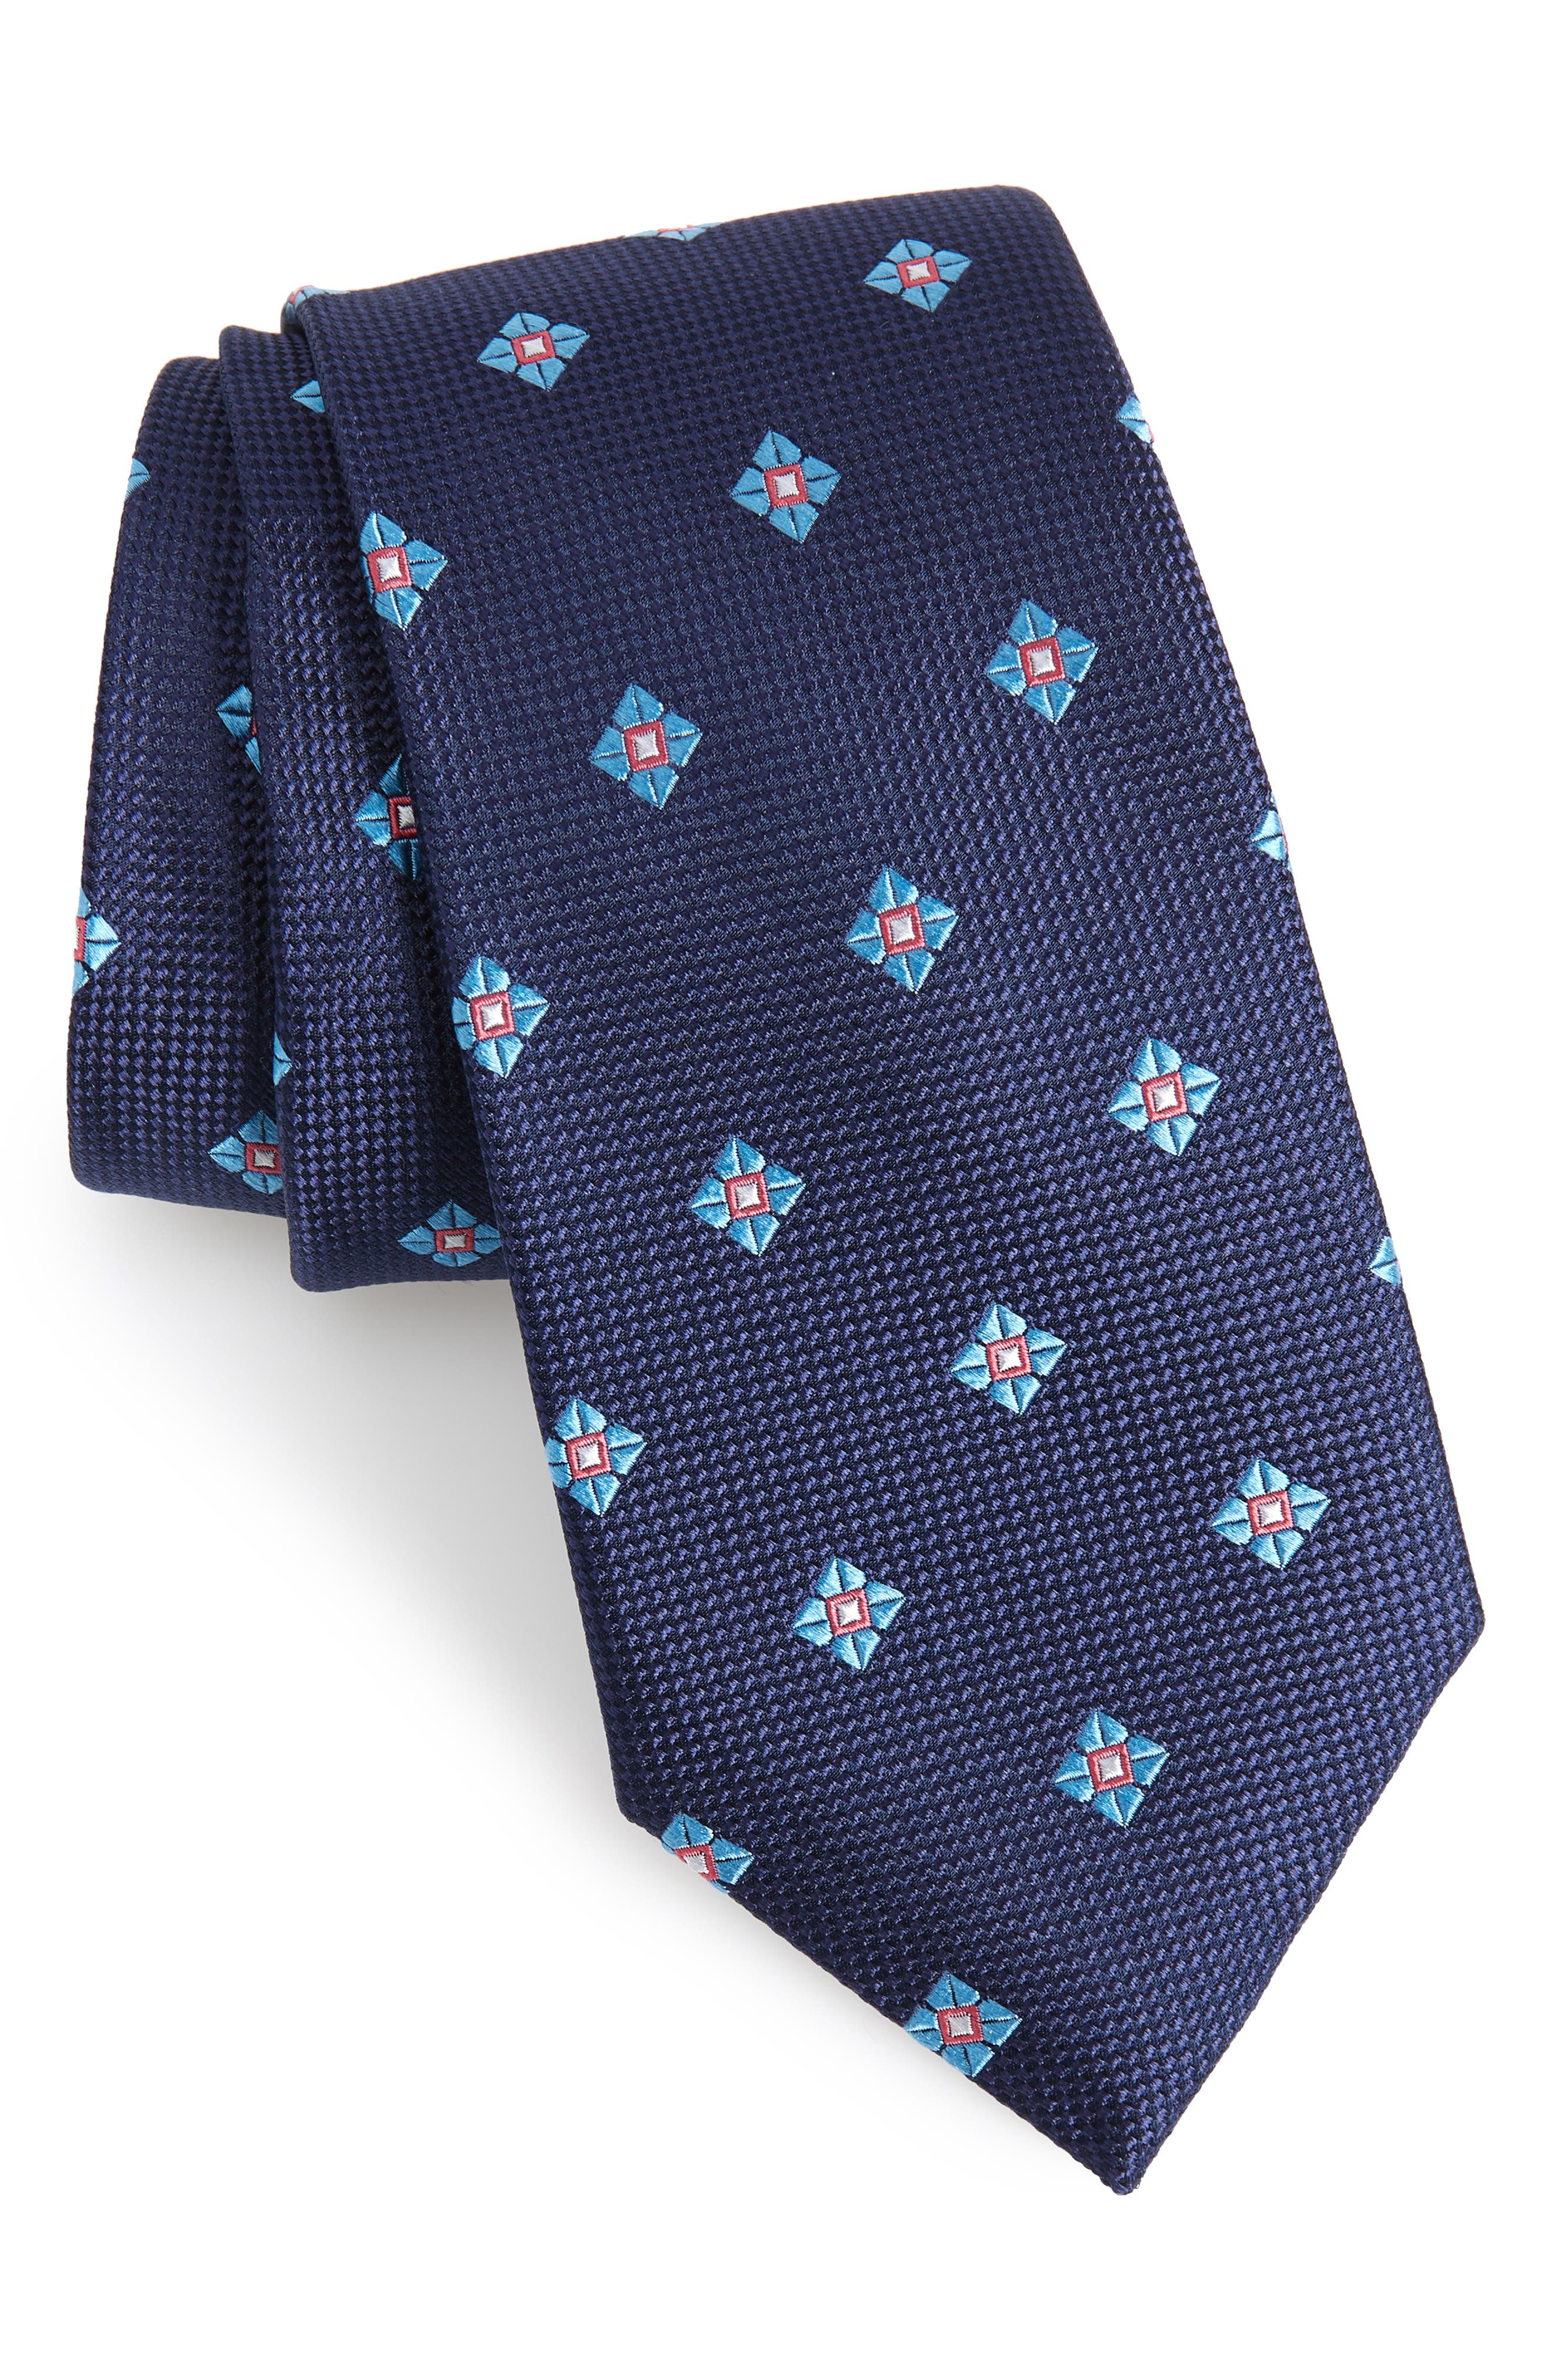 Oxford Medallion Silk Tie,                             Main thumbnail 1, color,                             Navy